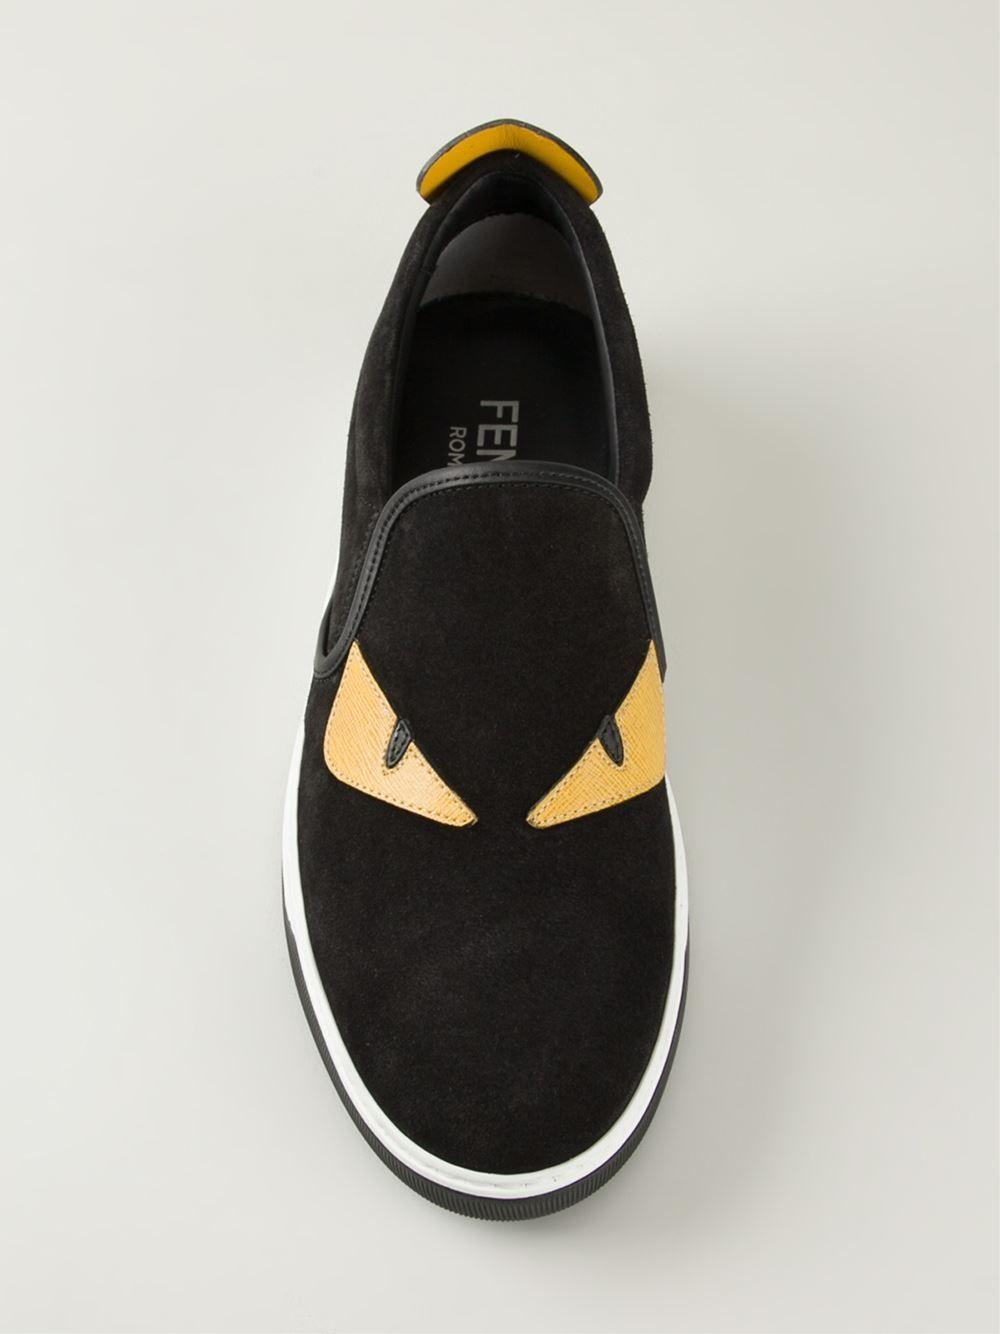 0dce6d8a Fendi Bag Bugs slip-on Sneakers | Men's Fashion that I love ...